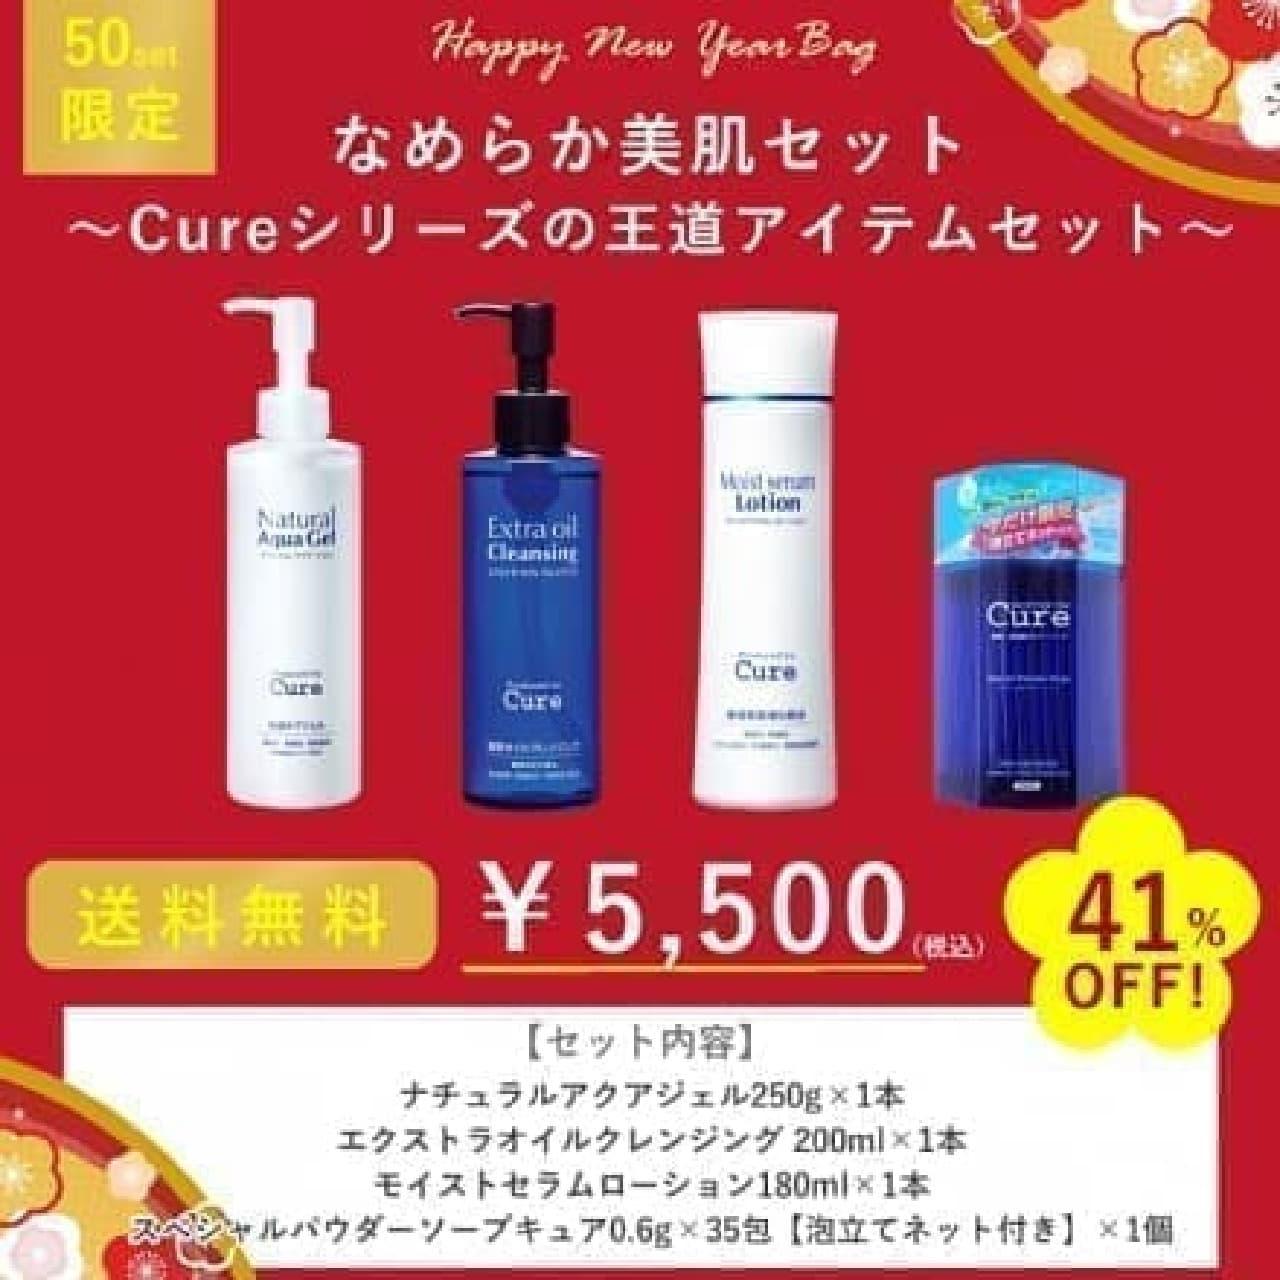 Cure「Happy New Year Bag(なめらか美肌セット)」